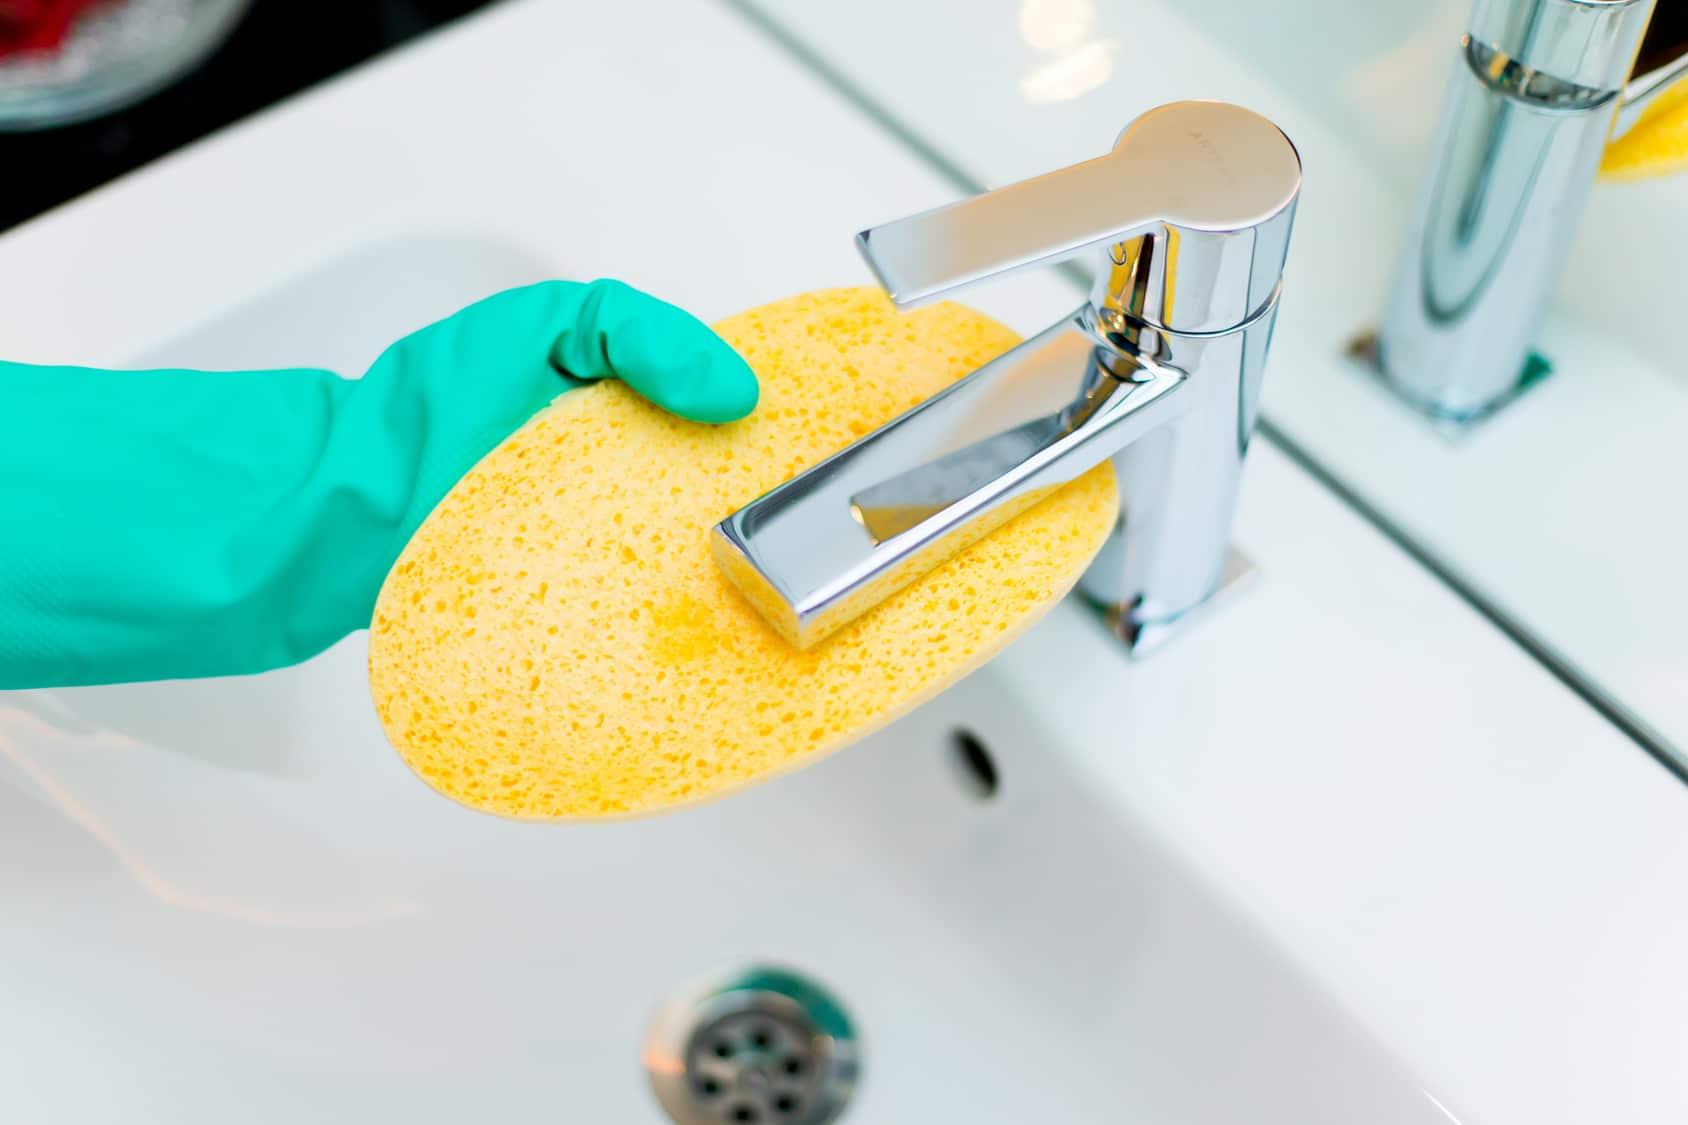 Reinigungsmaterial